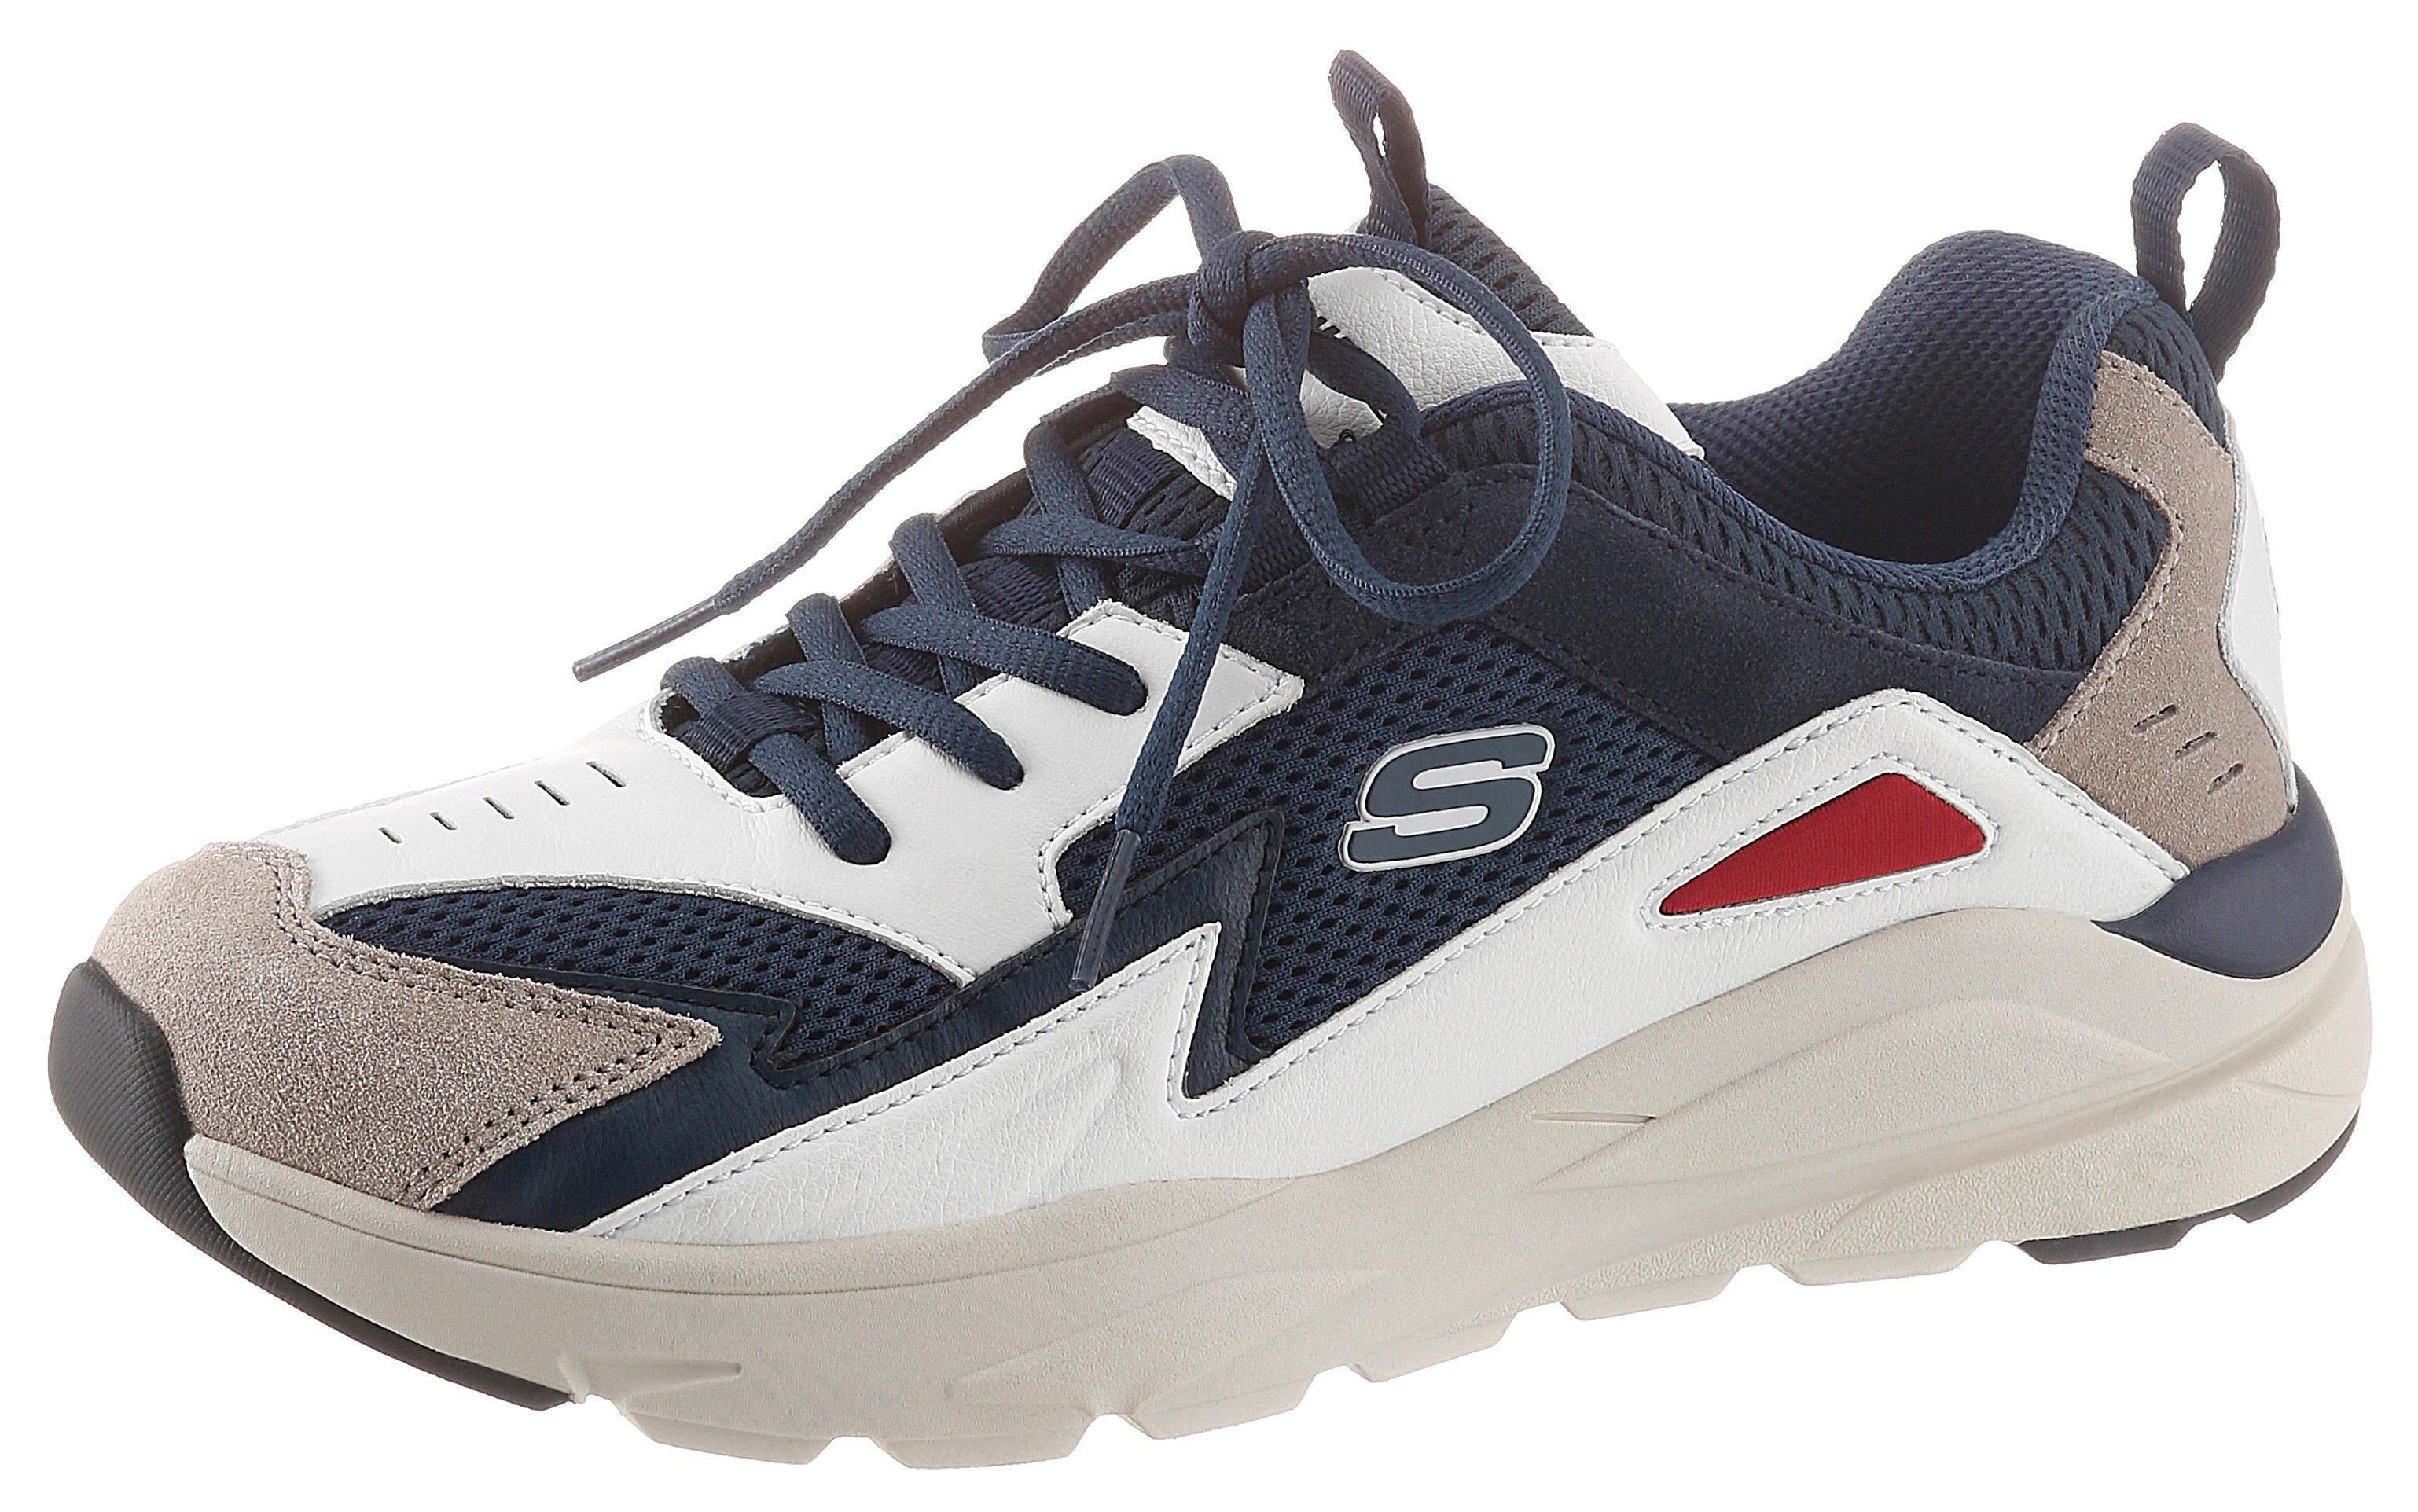 Skechers »Verrado« Sneaker mit Goga Mat Funktion | OTTO 9wjXZ